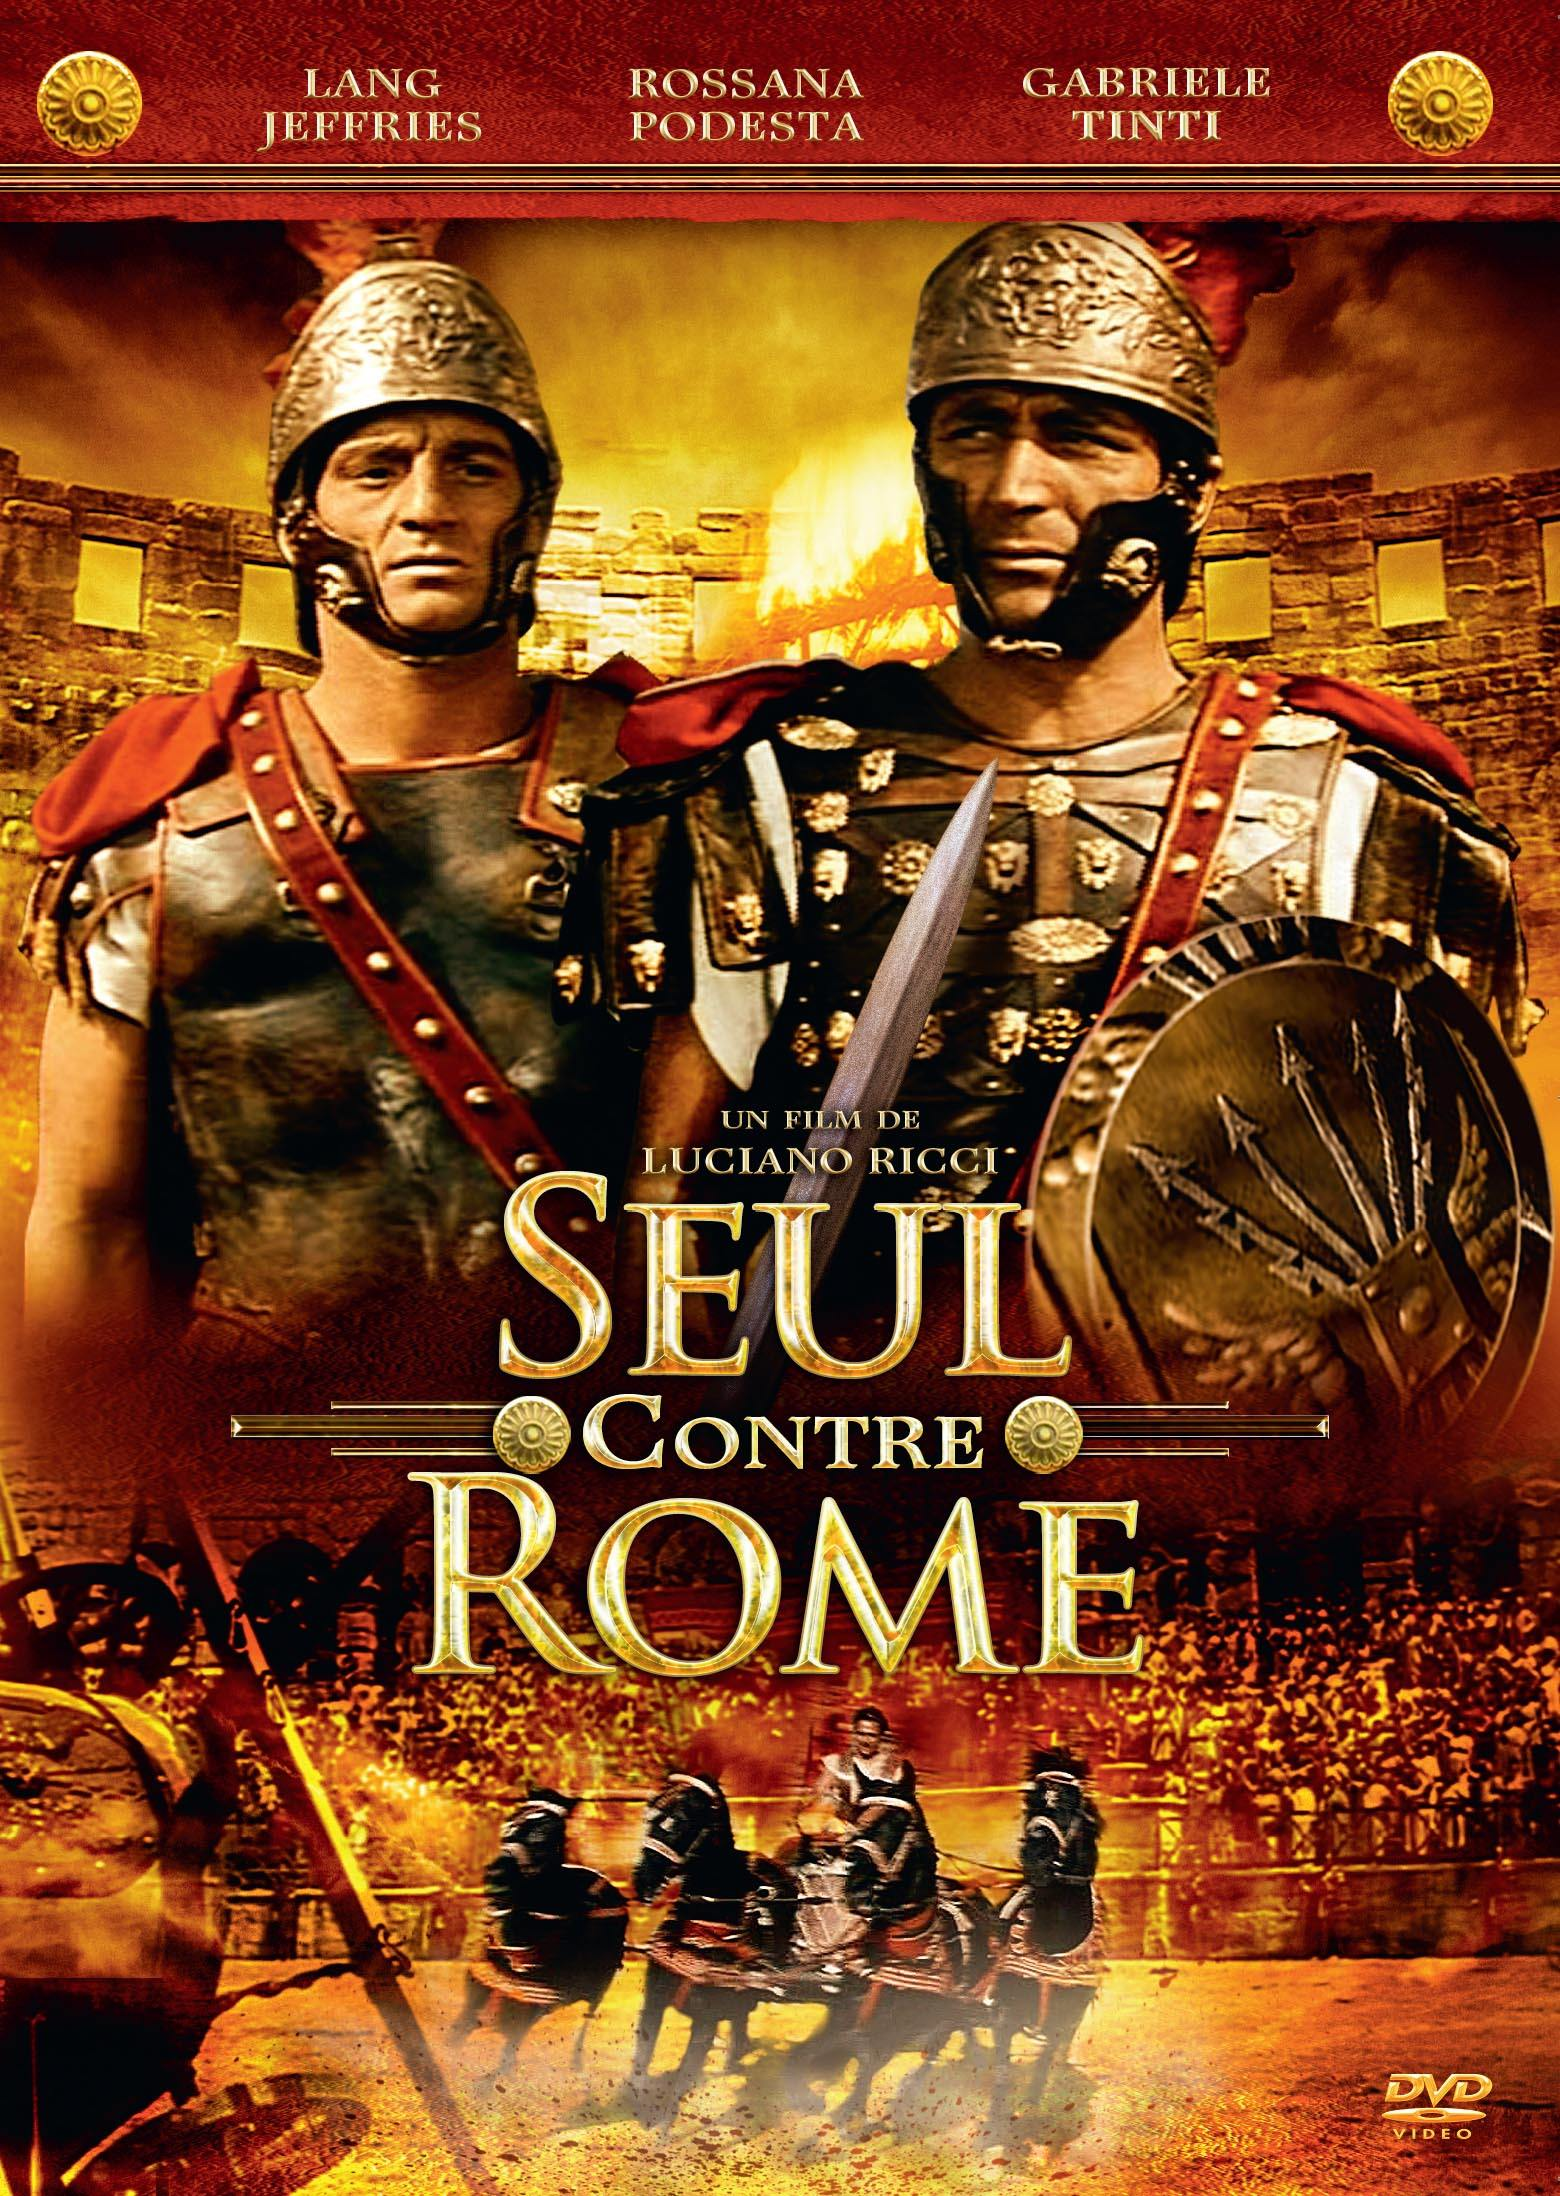 Seul contre rome - dvd